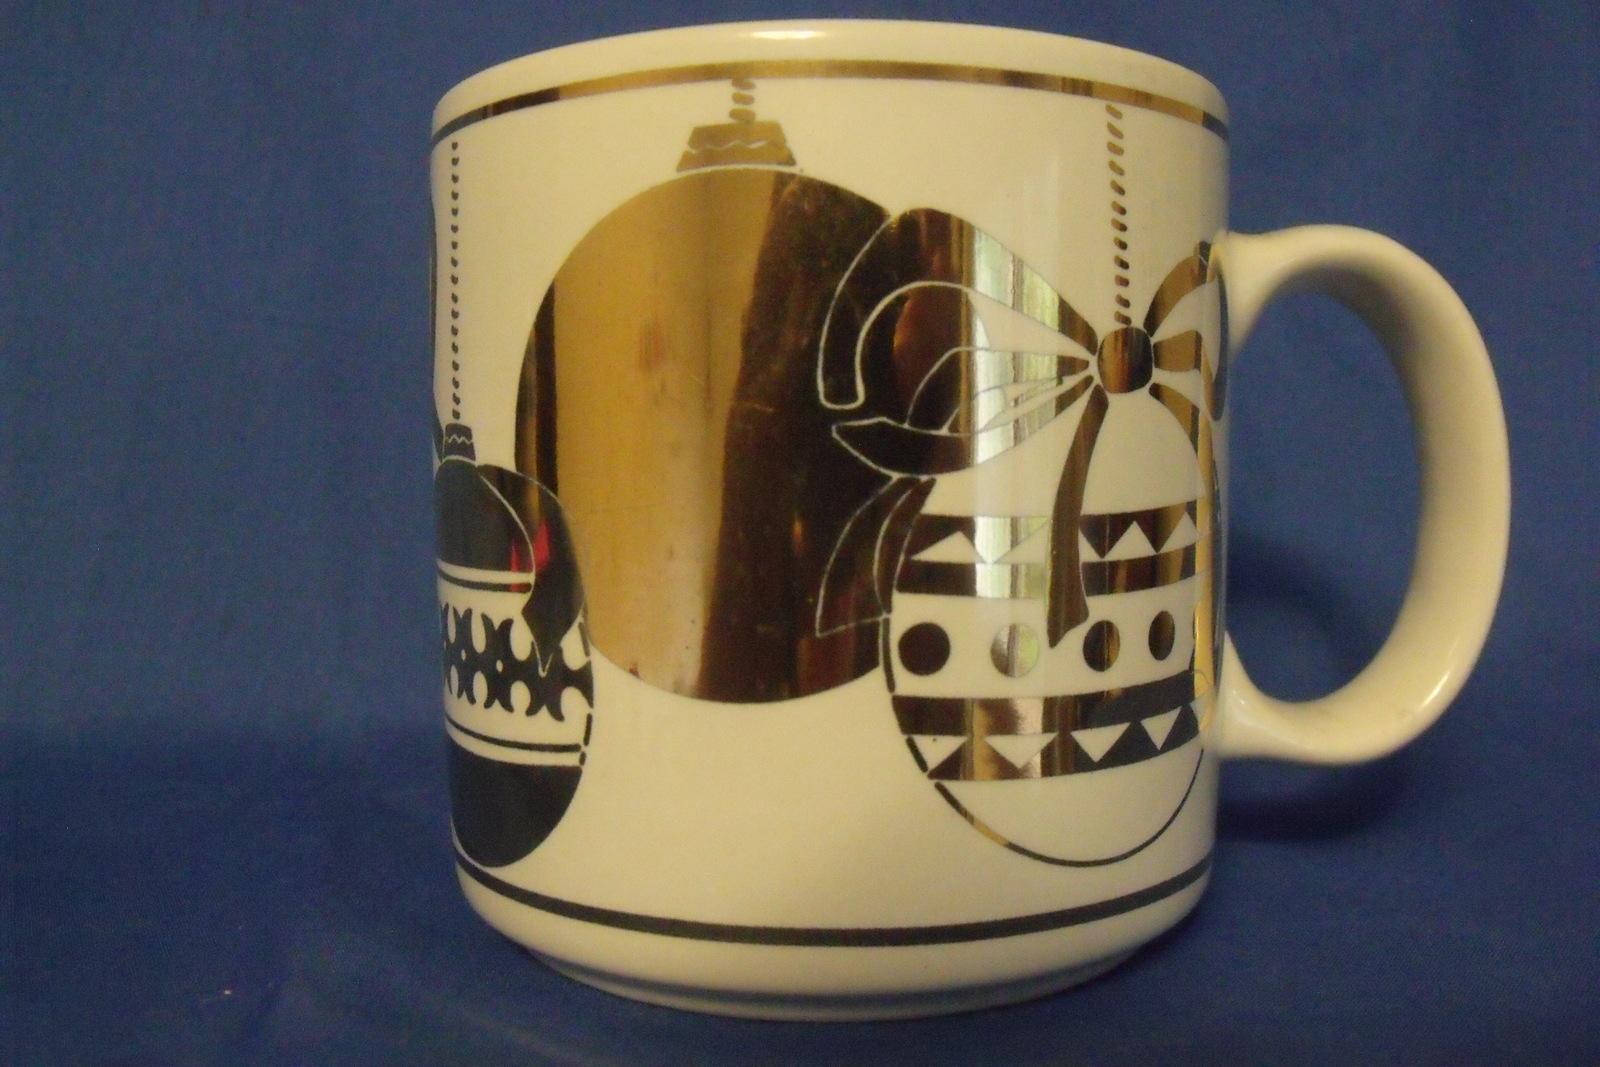 Russ Berrie White Gold Christmas Balls Coffee Tea Mug - $5.95